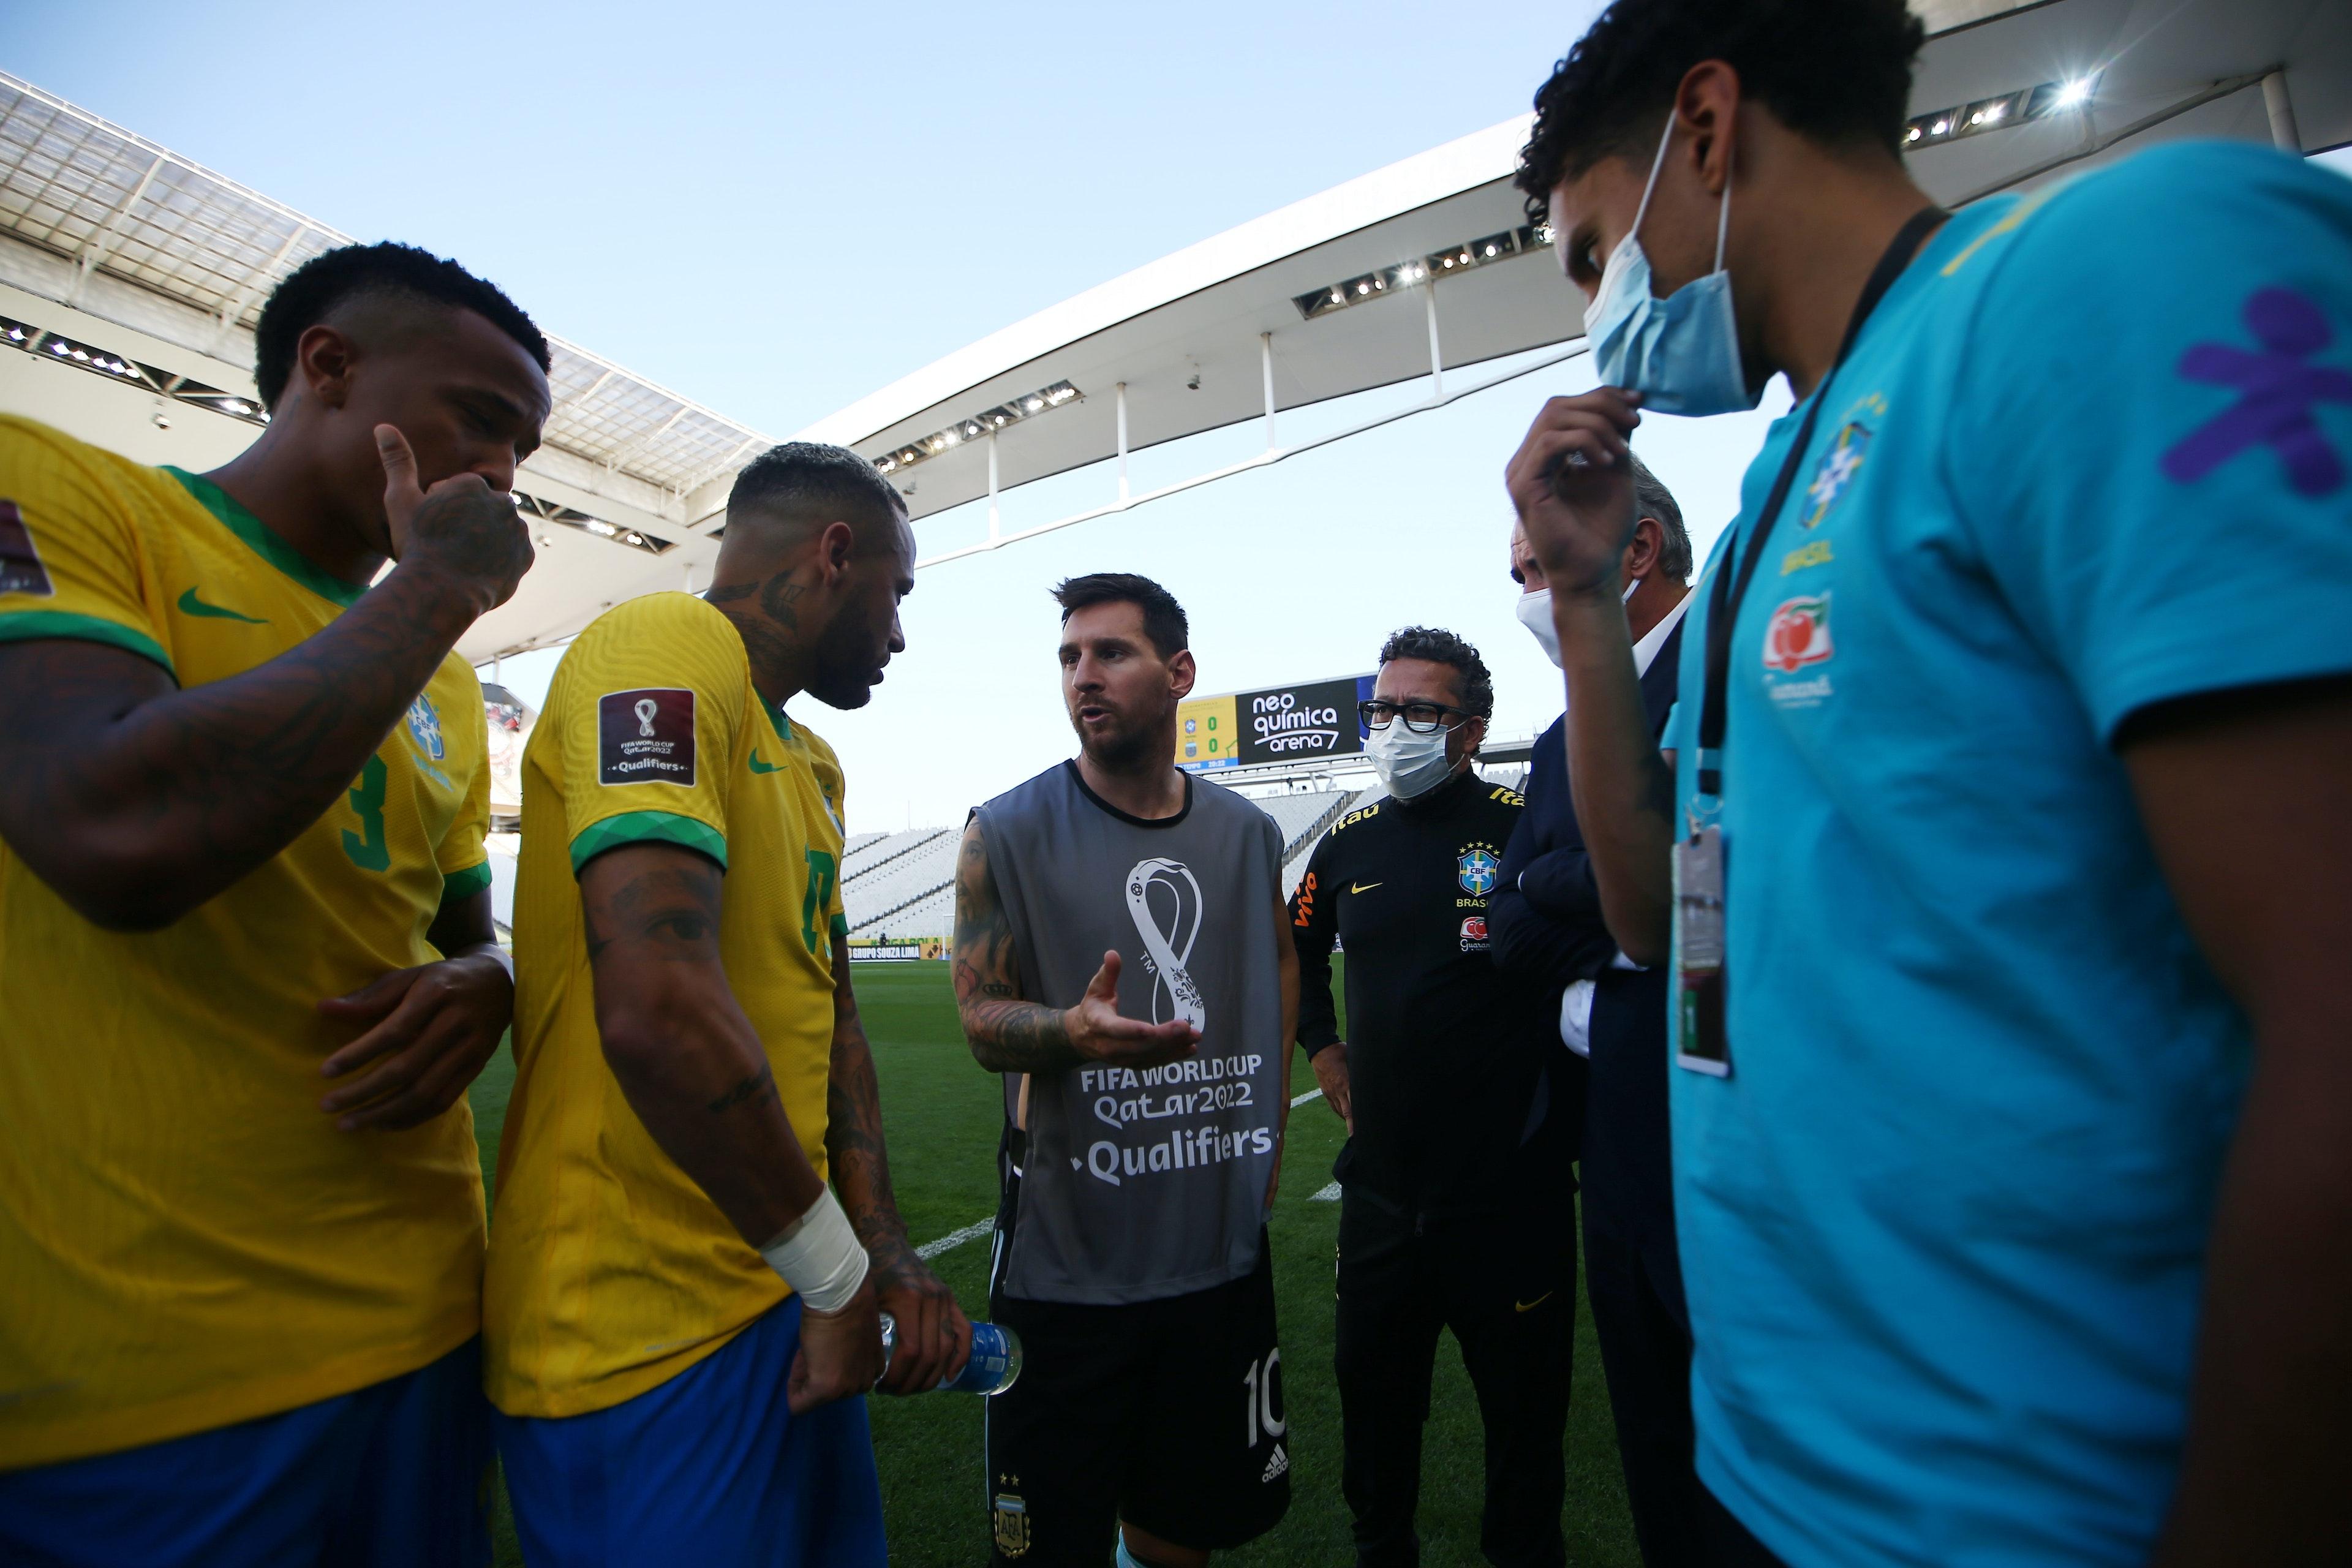 Brazil v Argentina - FIFA World Cup 2022 Qatar Qualifier